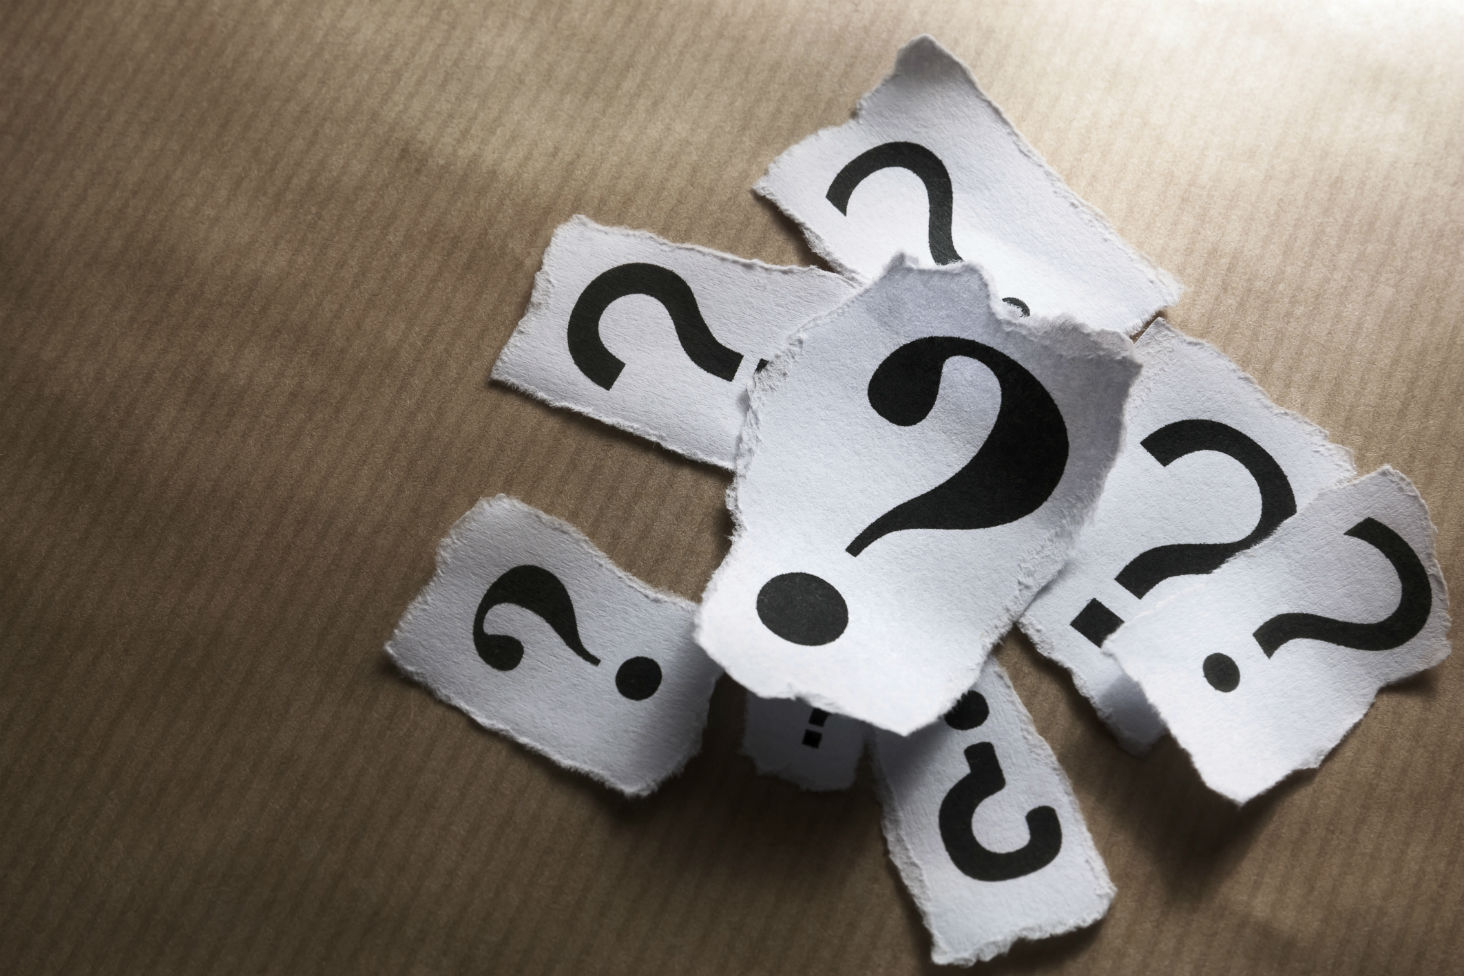 Kỹ năng đặt câu hỏi - Blog.quatructuyen.com